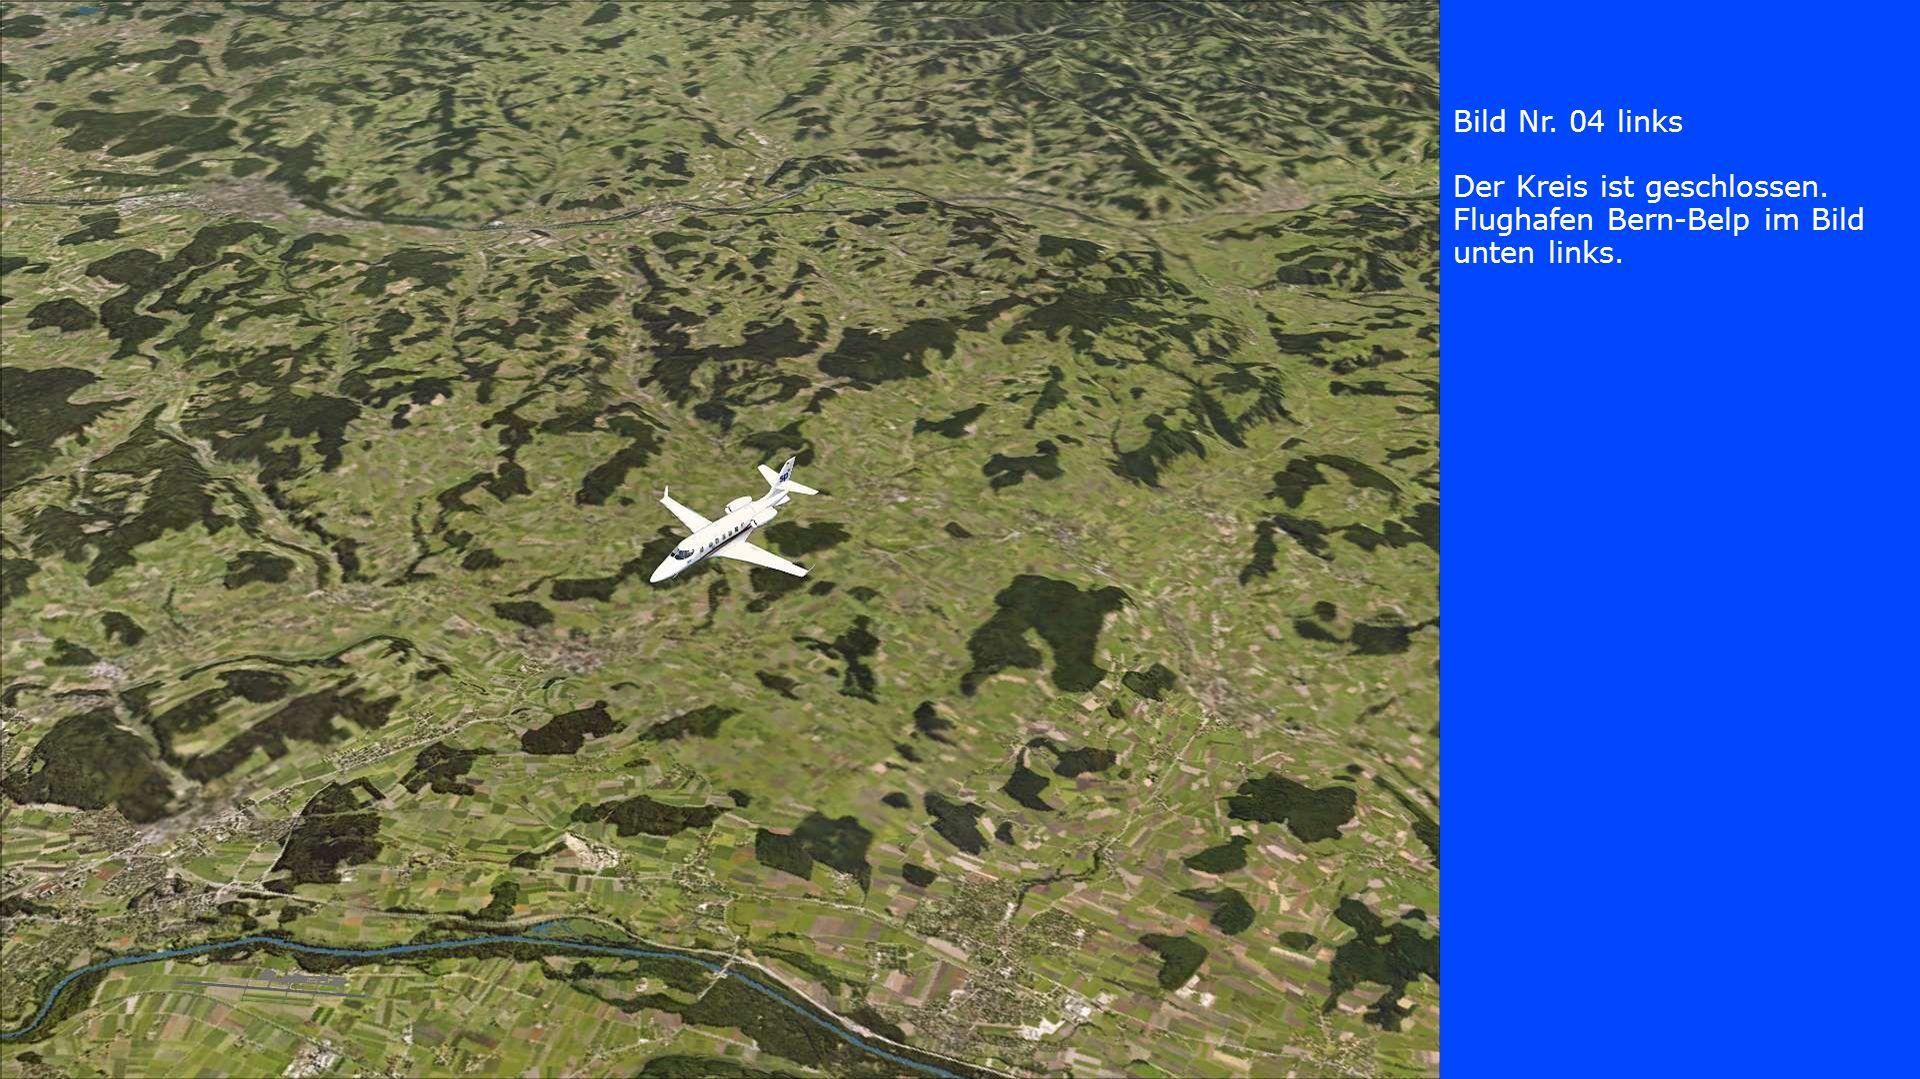 Bild Nr. 04 links Der Kreis ist geschlossen. Flughafen Bern-Belp im Bild unten links.